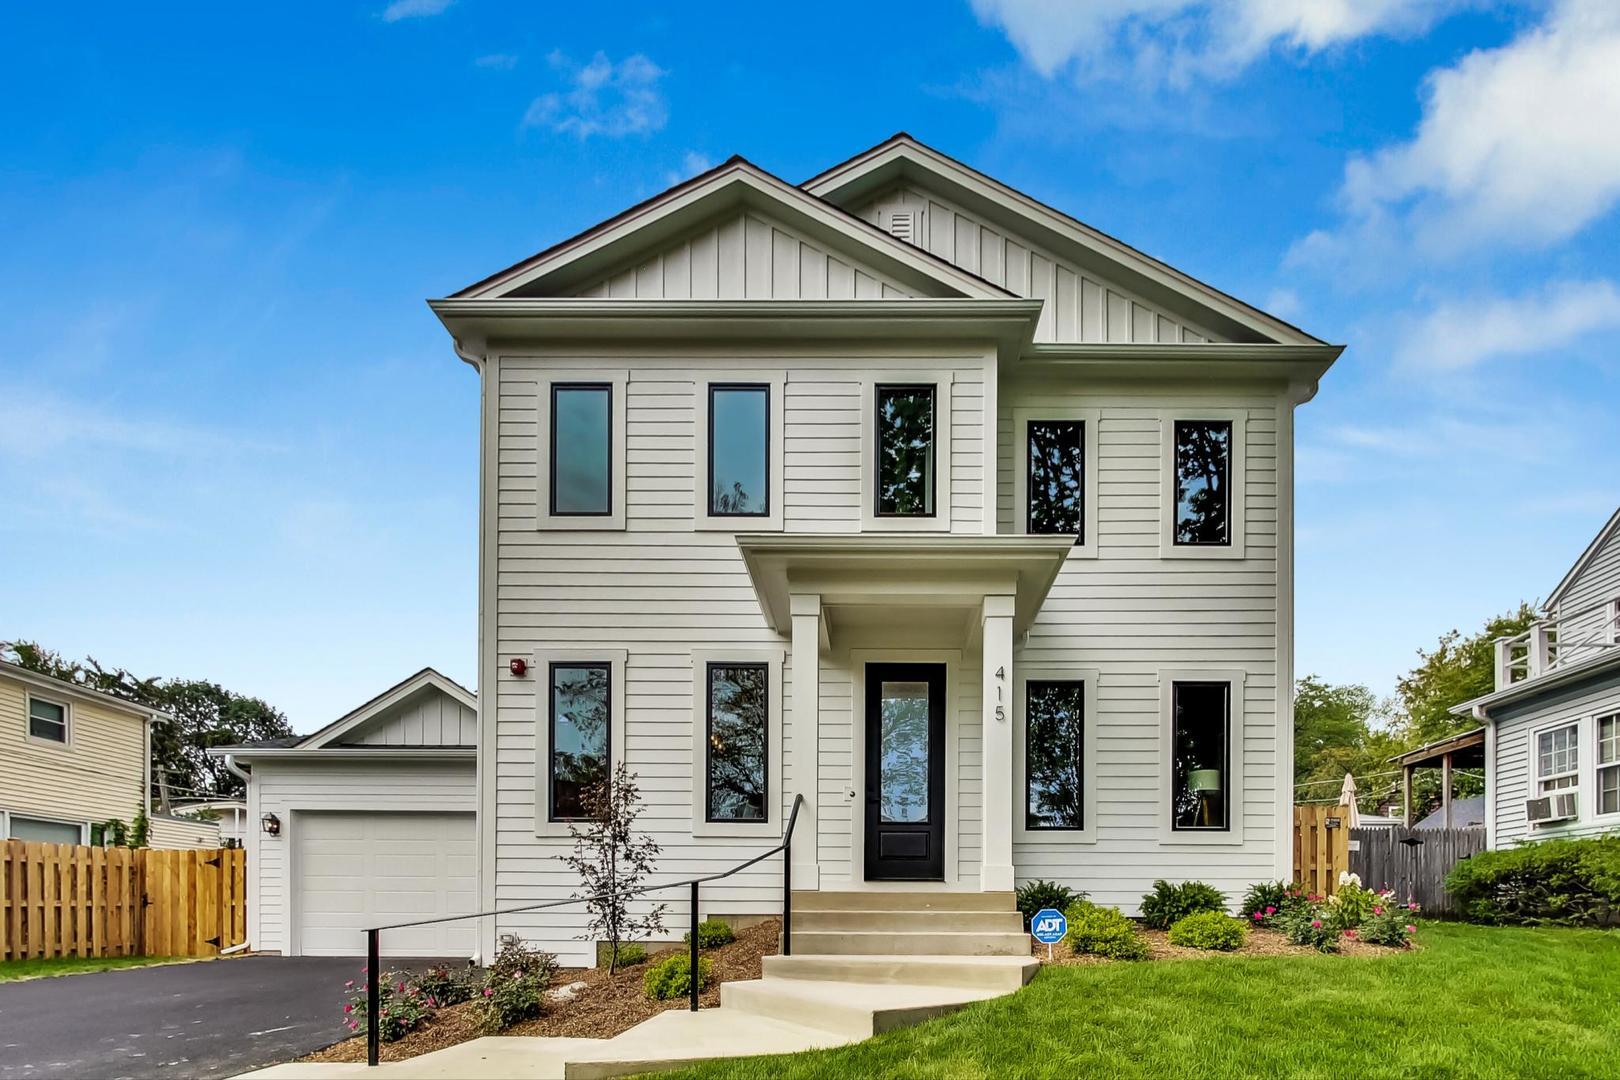 415 Windsor Terrace, Libertyville, Il 60048